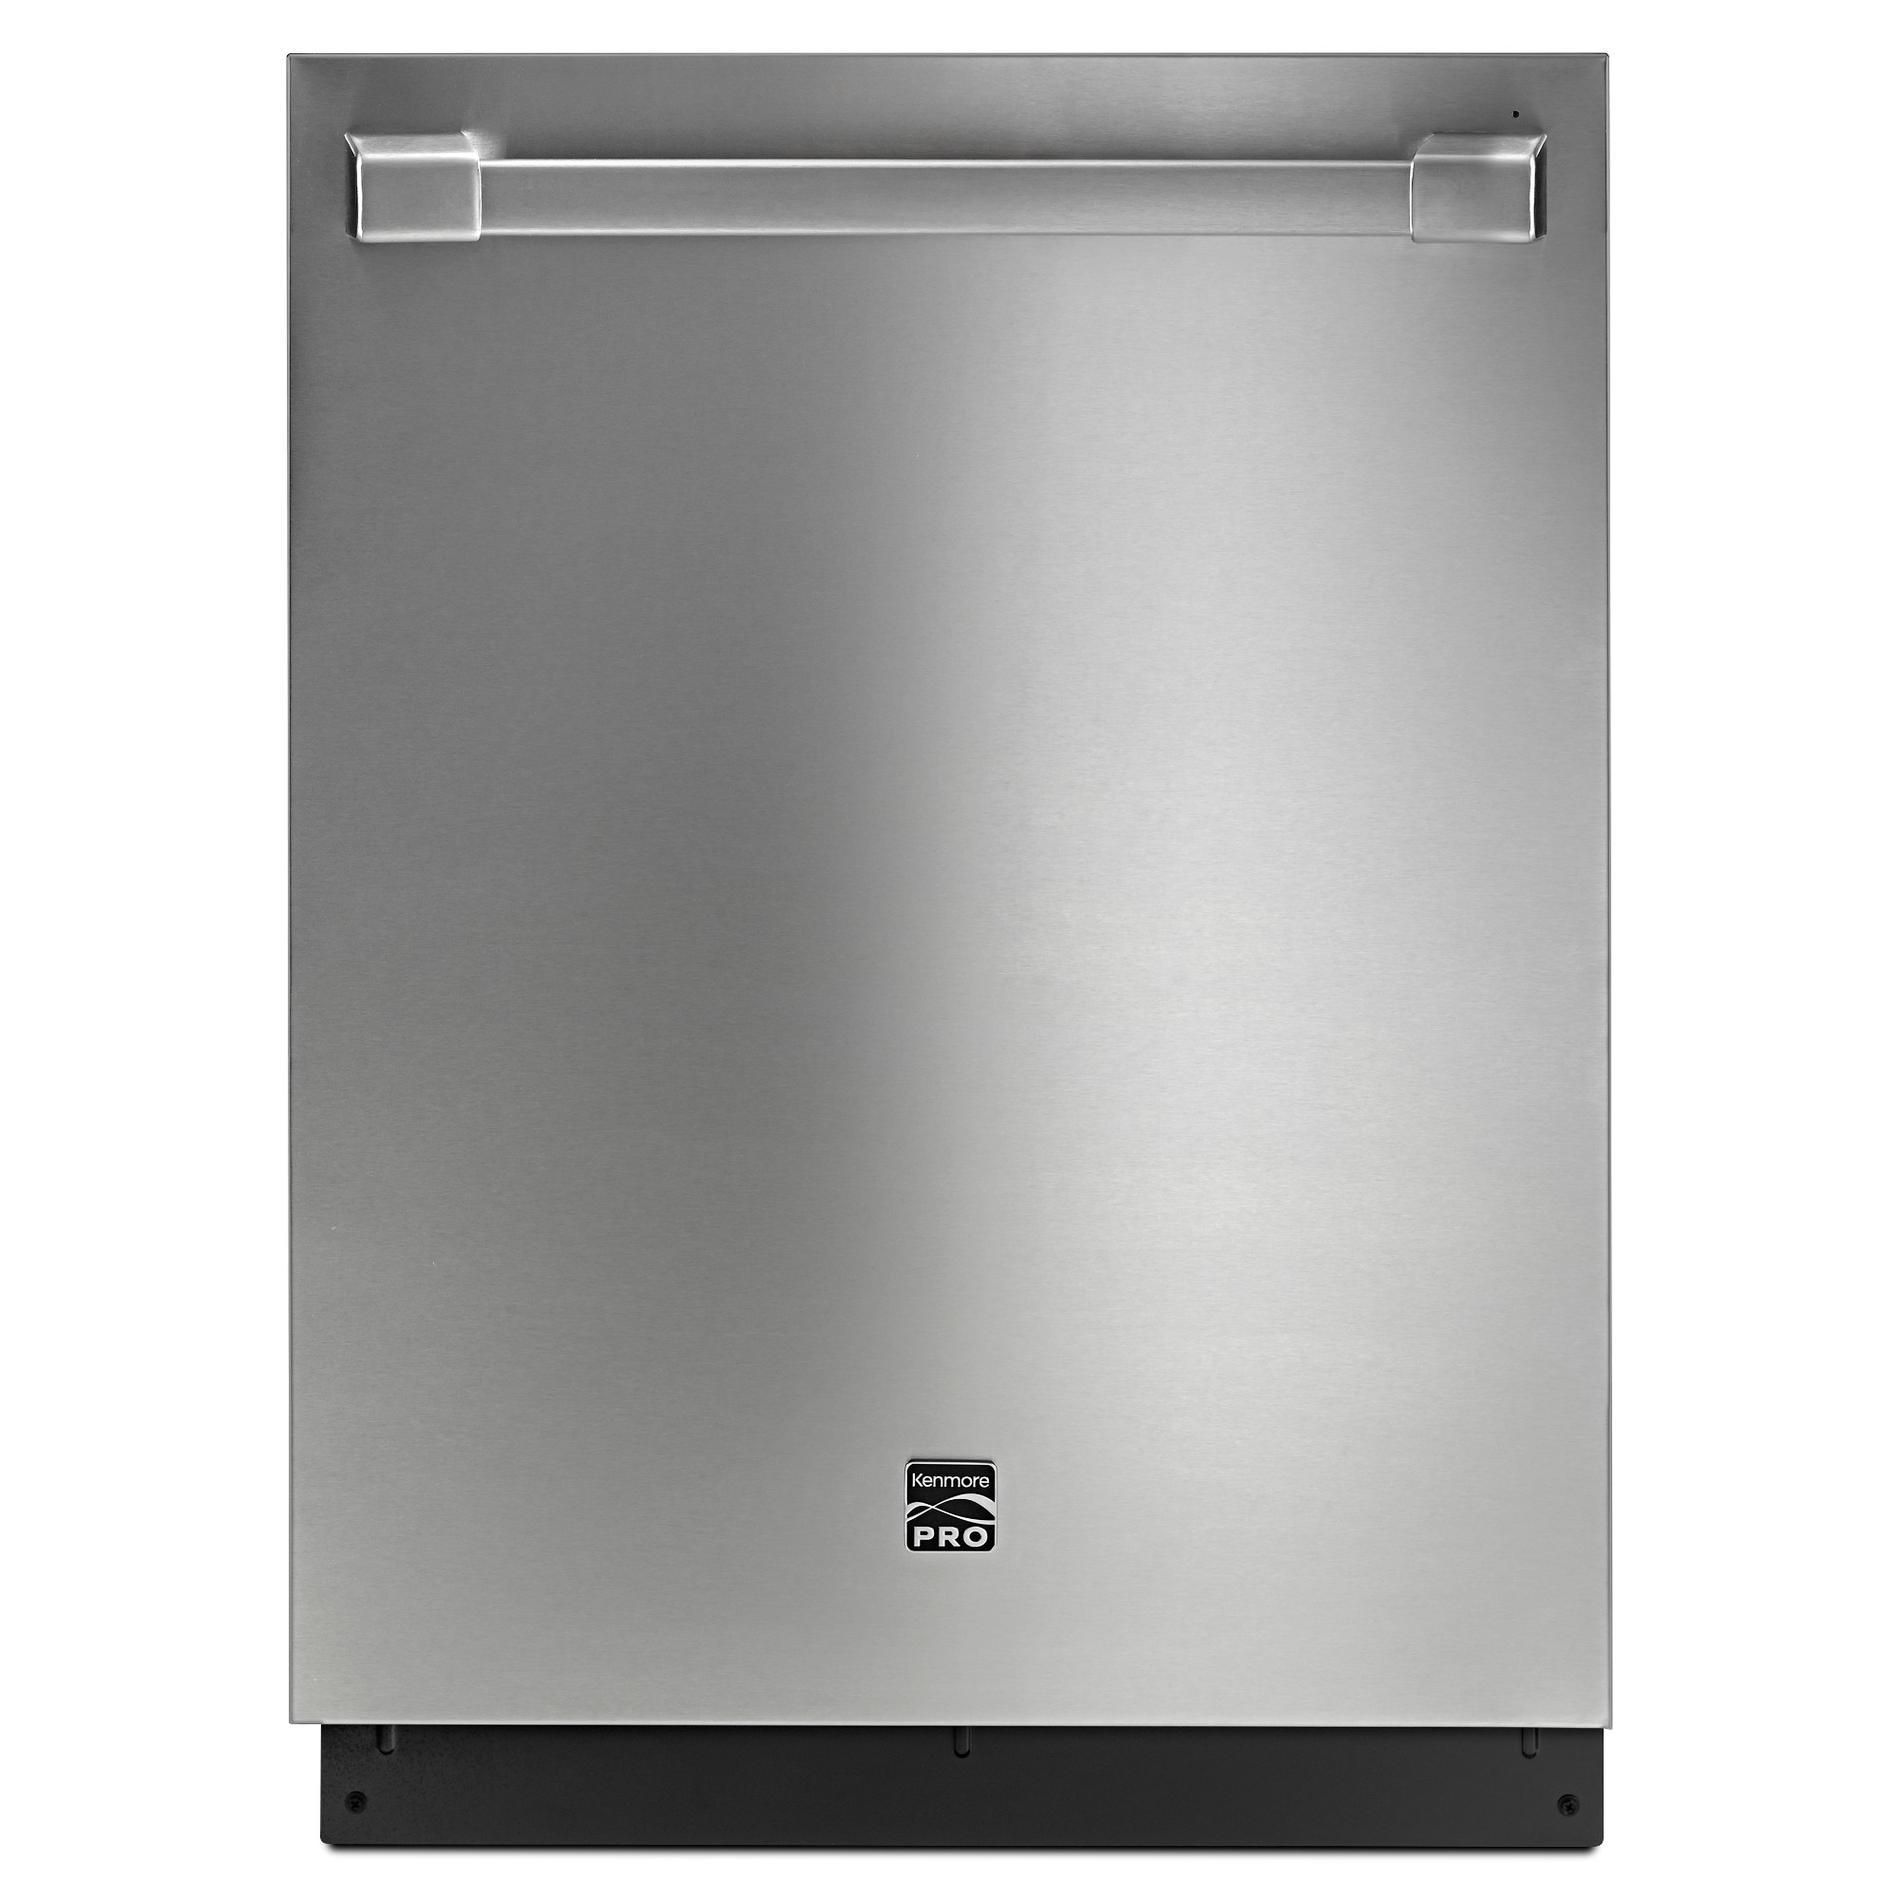 Kenmore Elite Dishwasher Stainless Steel